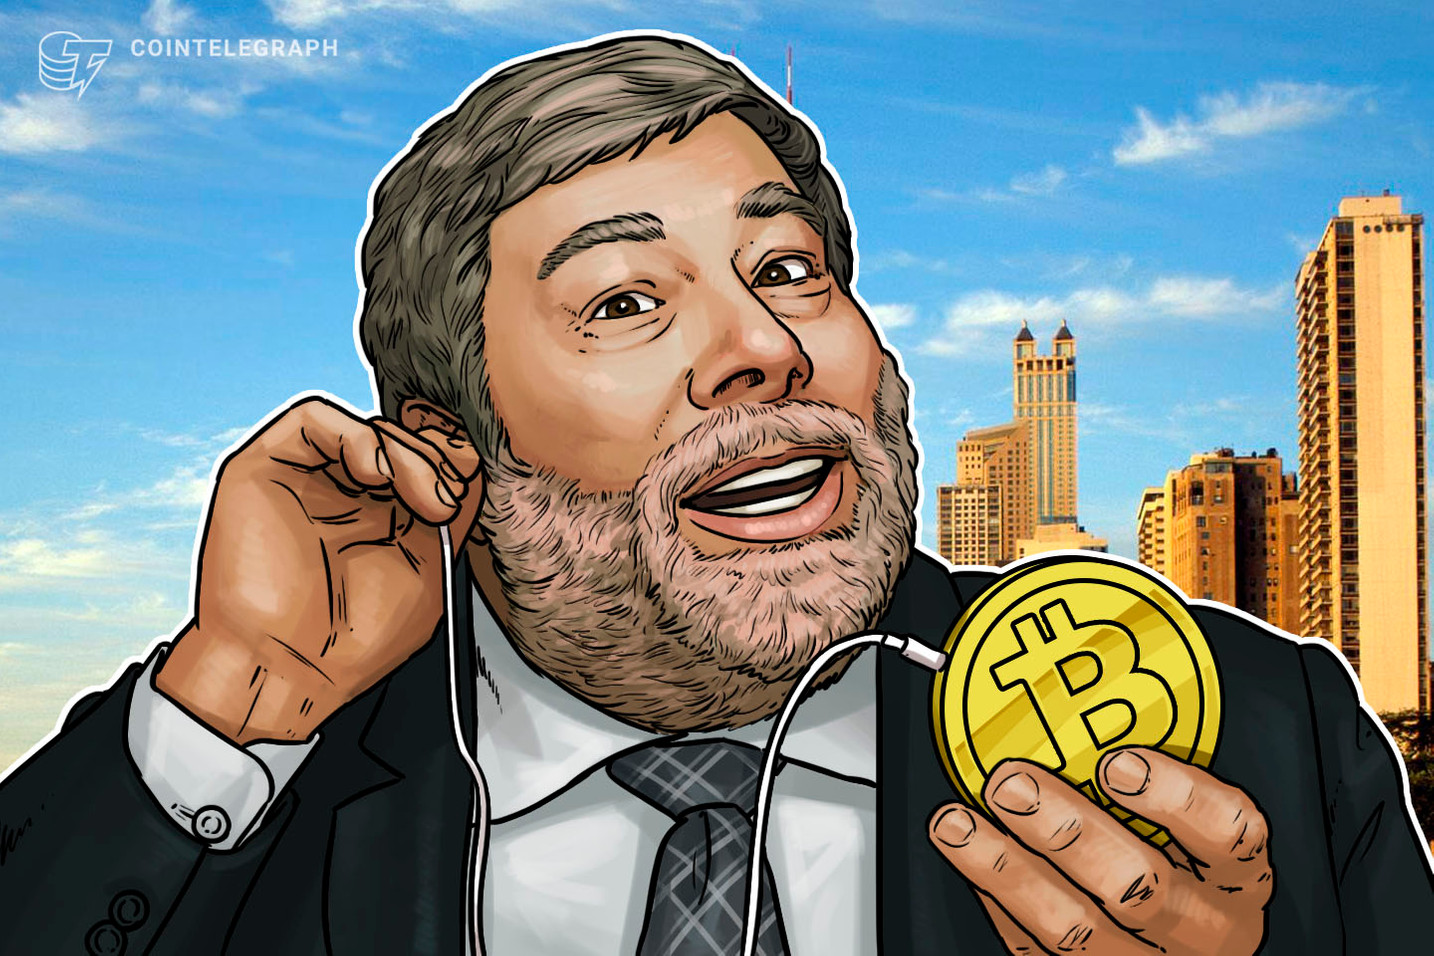 Apple Co-Founder Steve Wozniak Declares He Sold All His BTC Holdings at $20,000 Peak